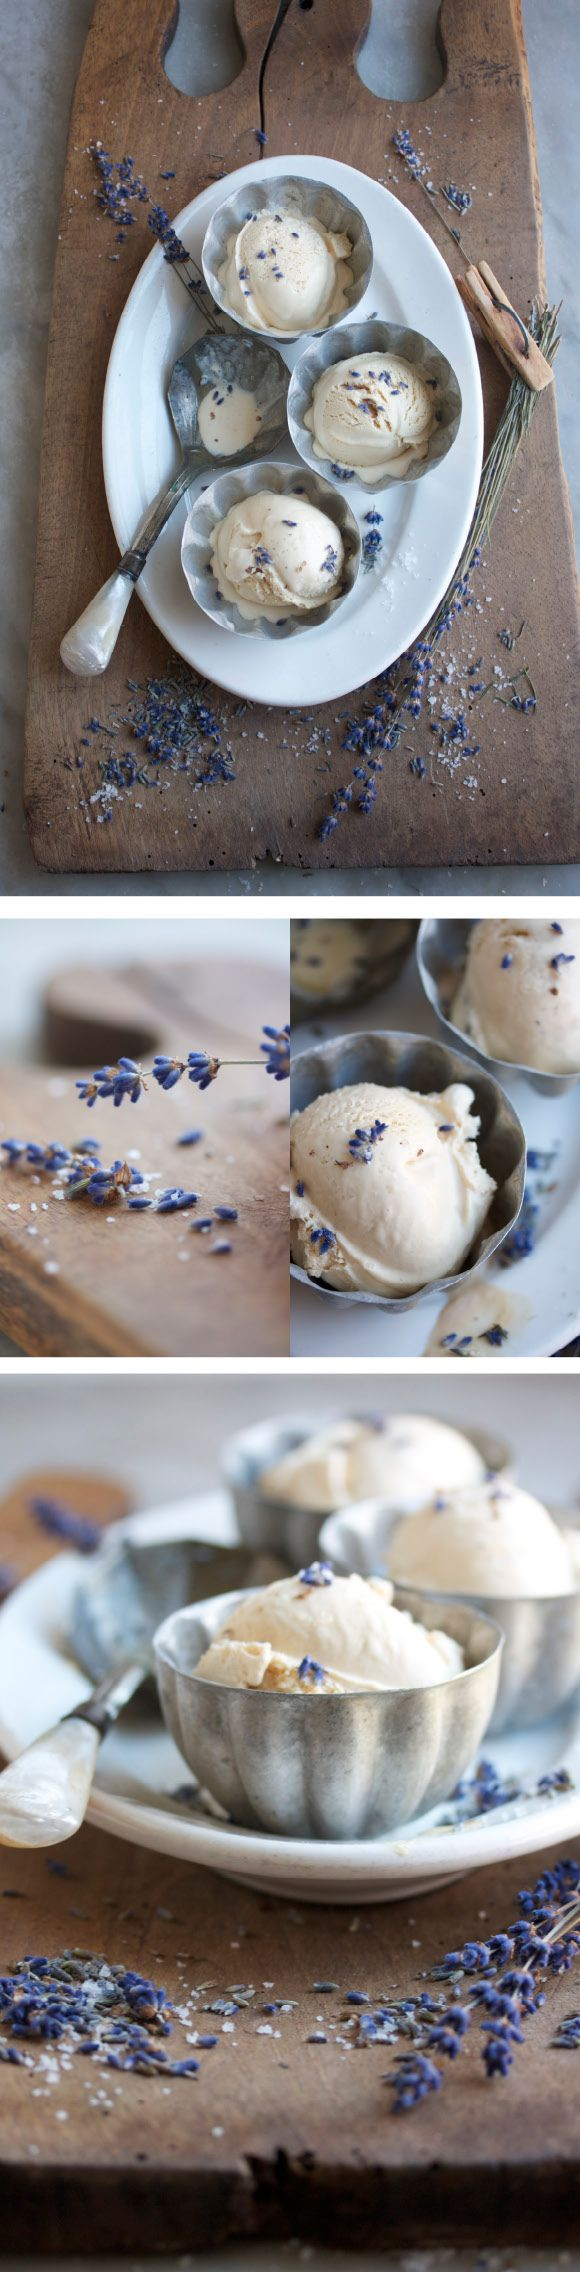 25+ best ideas about Caramel Ice Cream on Pinterest | Easy ...